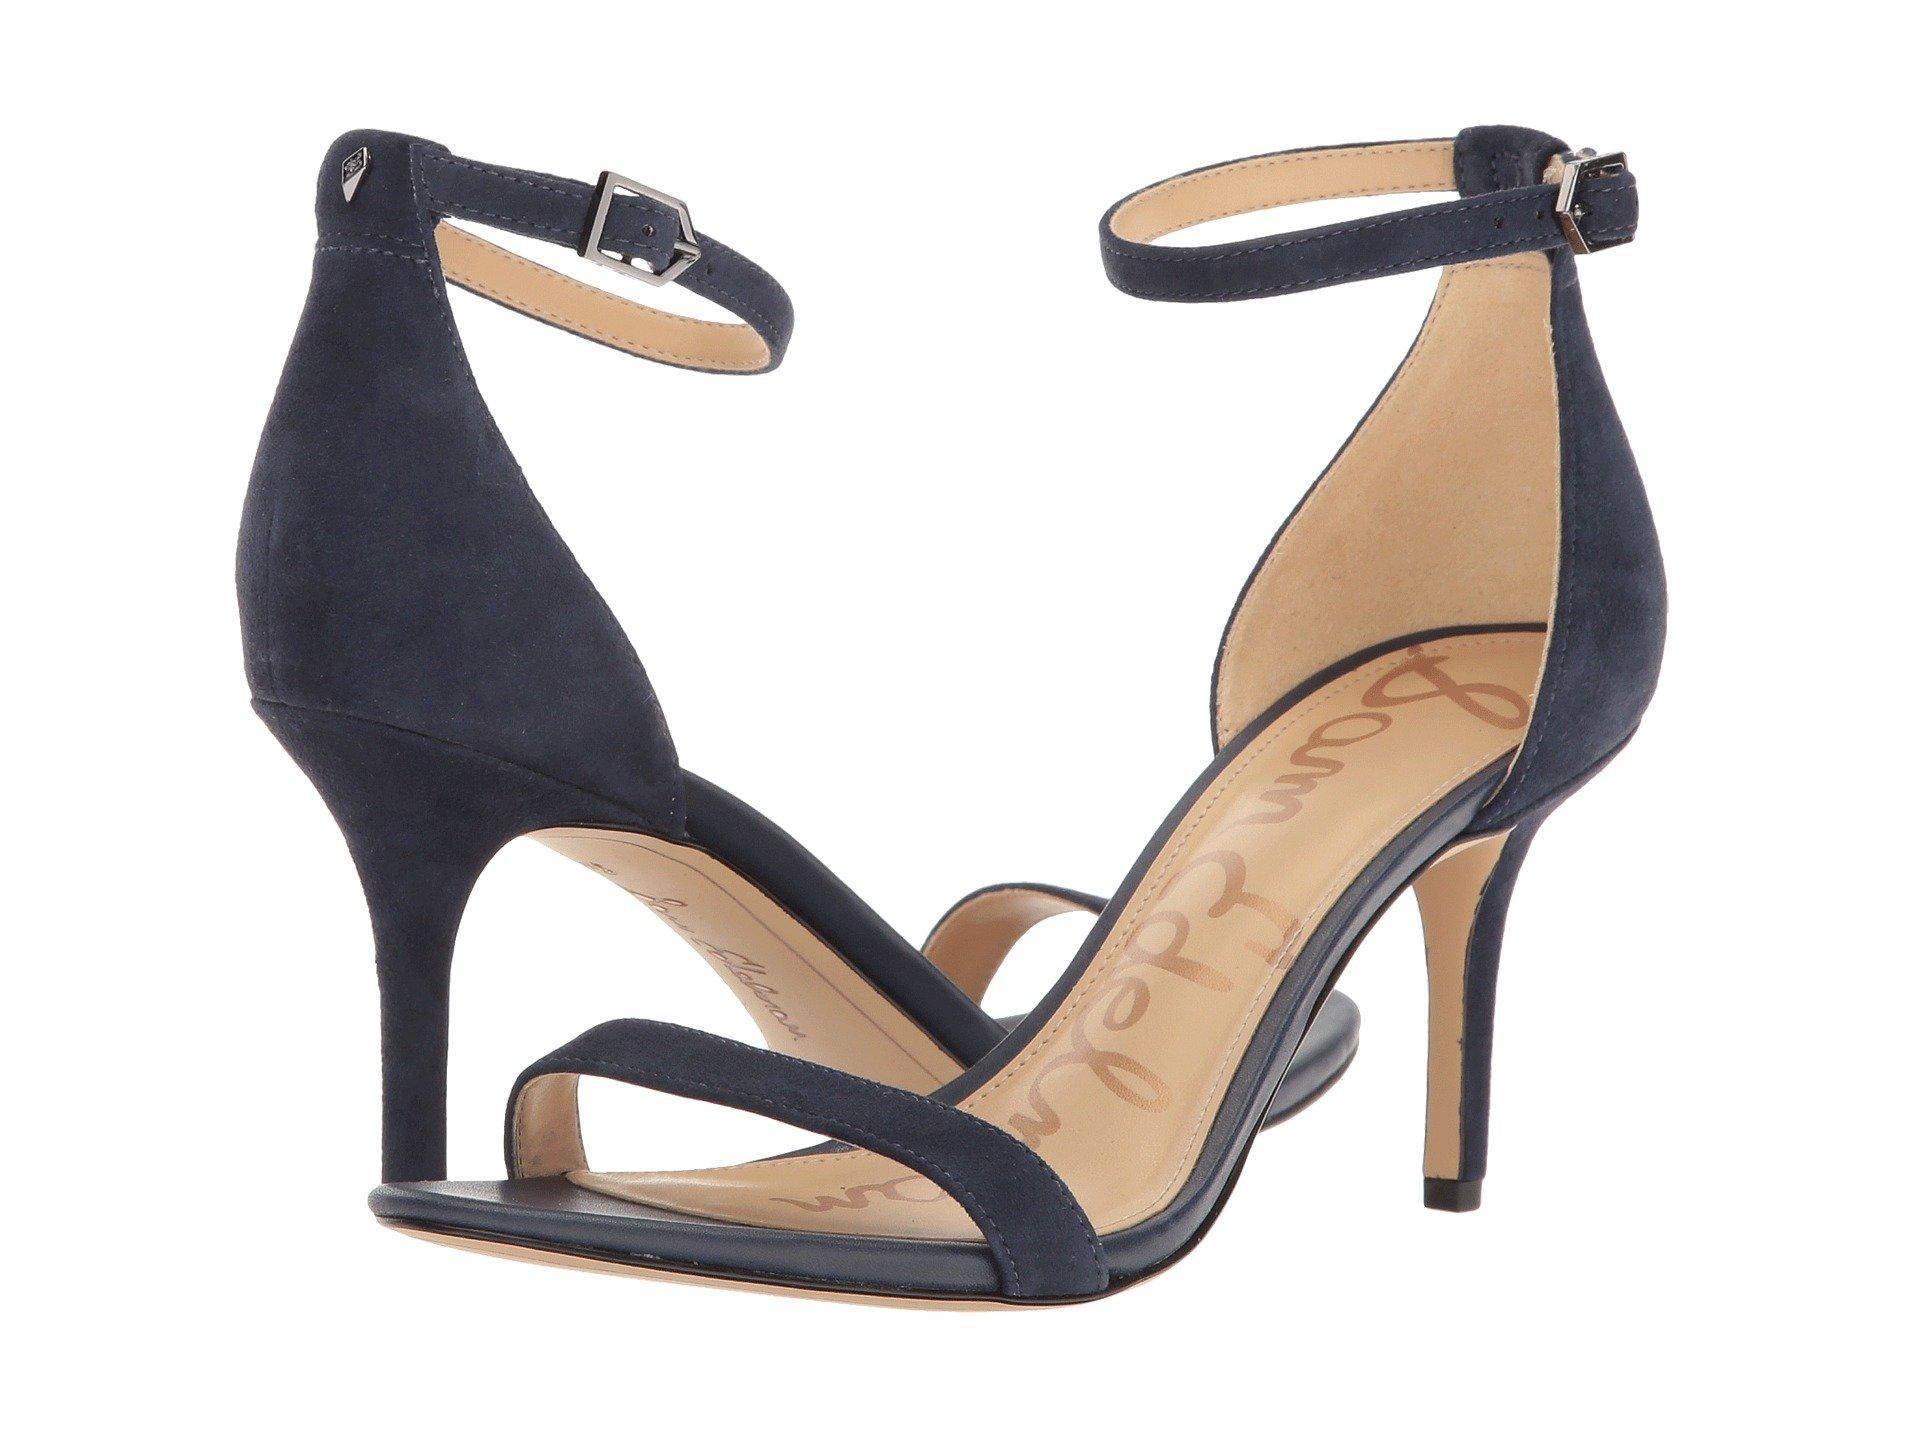 92ba4bf71bf7f7 Sam Edelman Patti Leather Ankle-Strap Sandal In Black